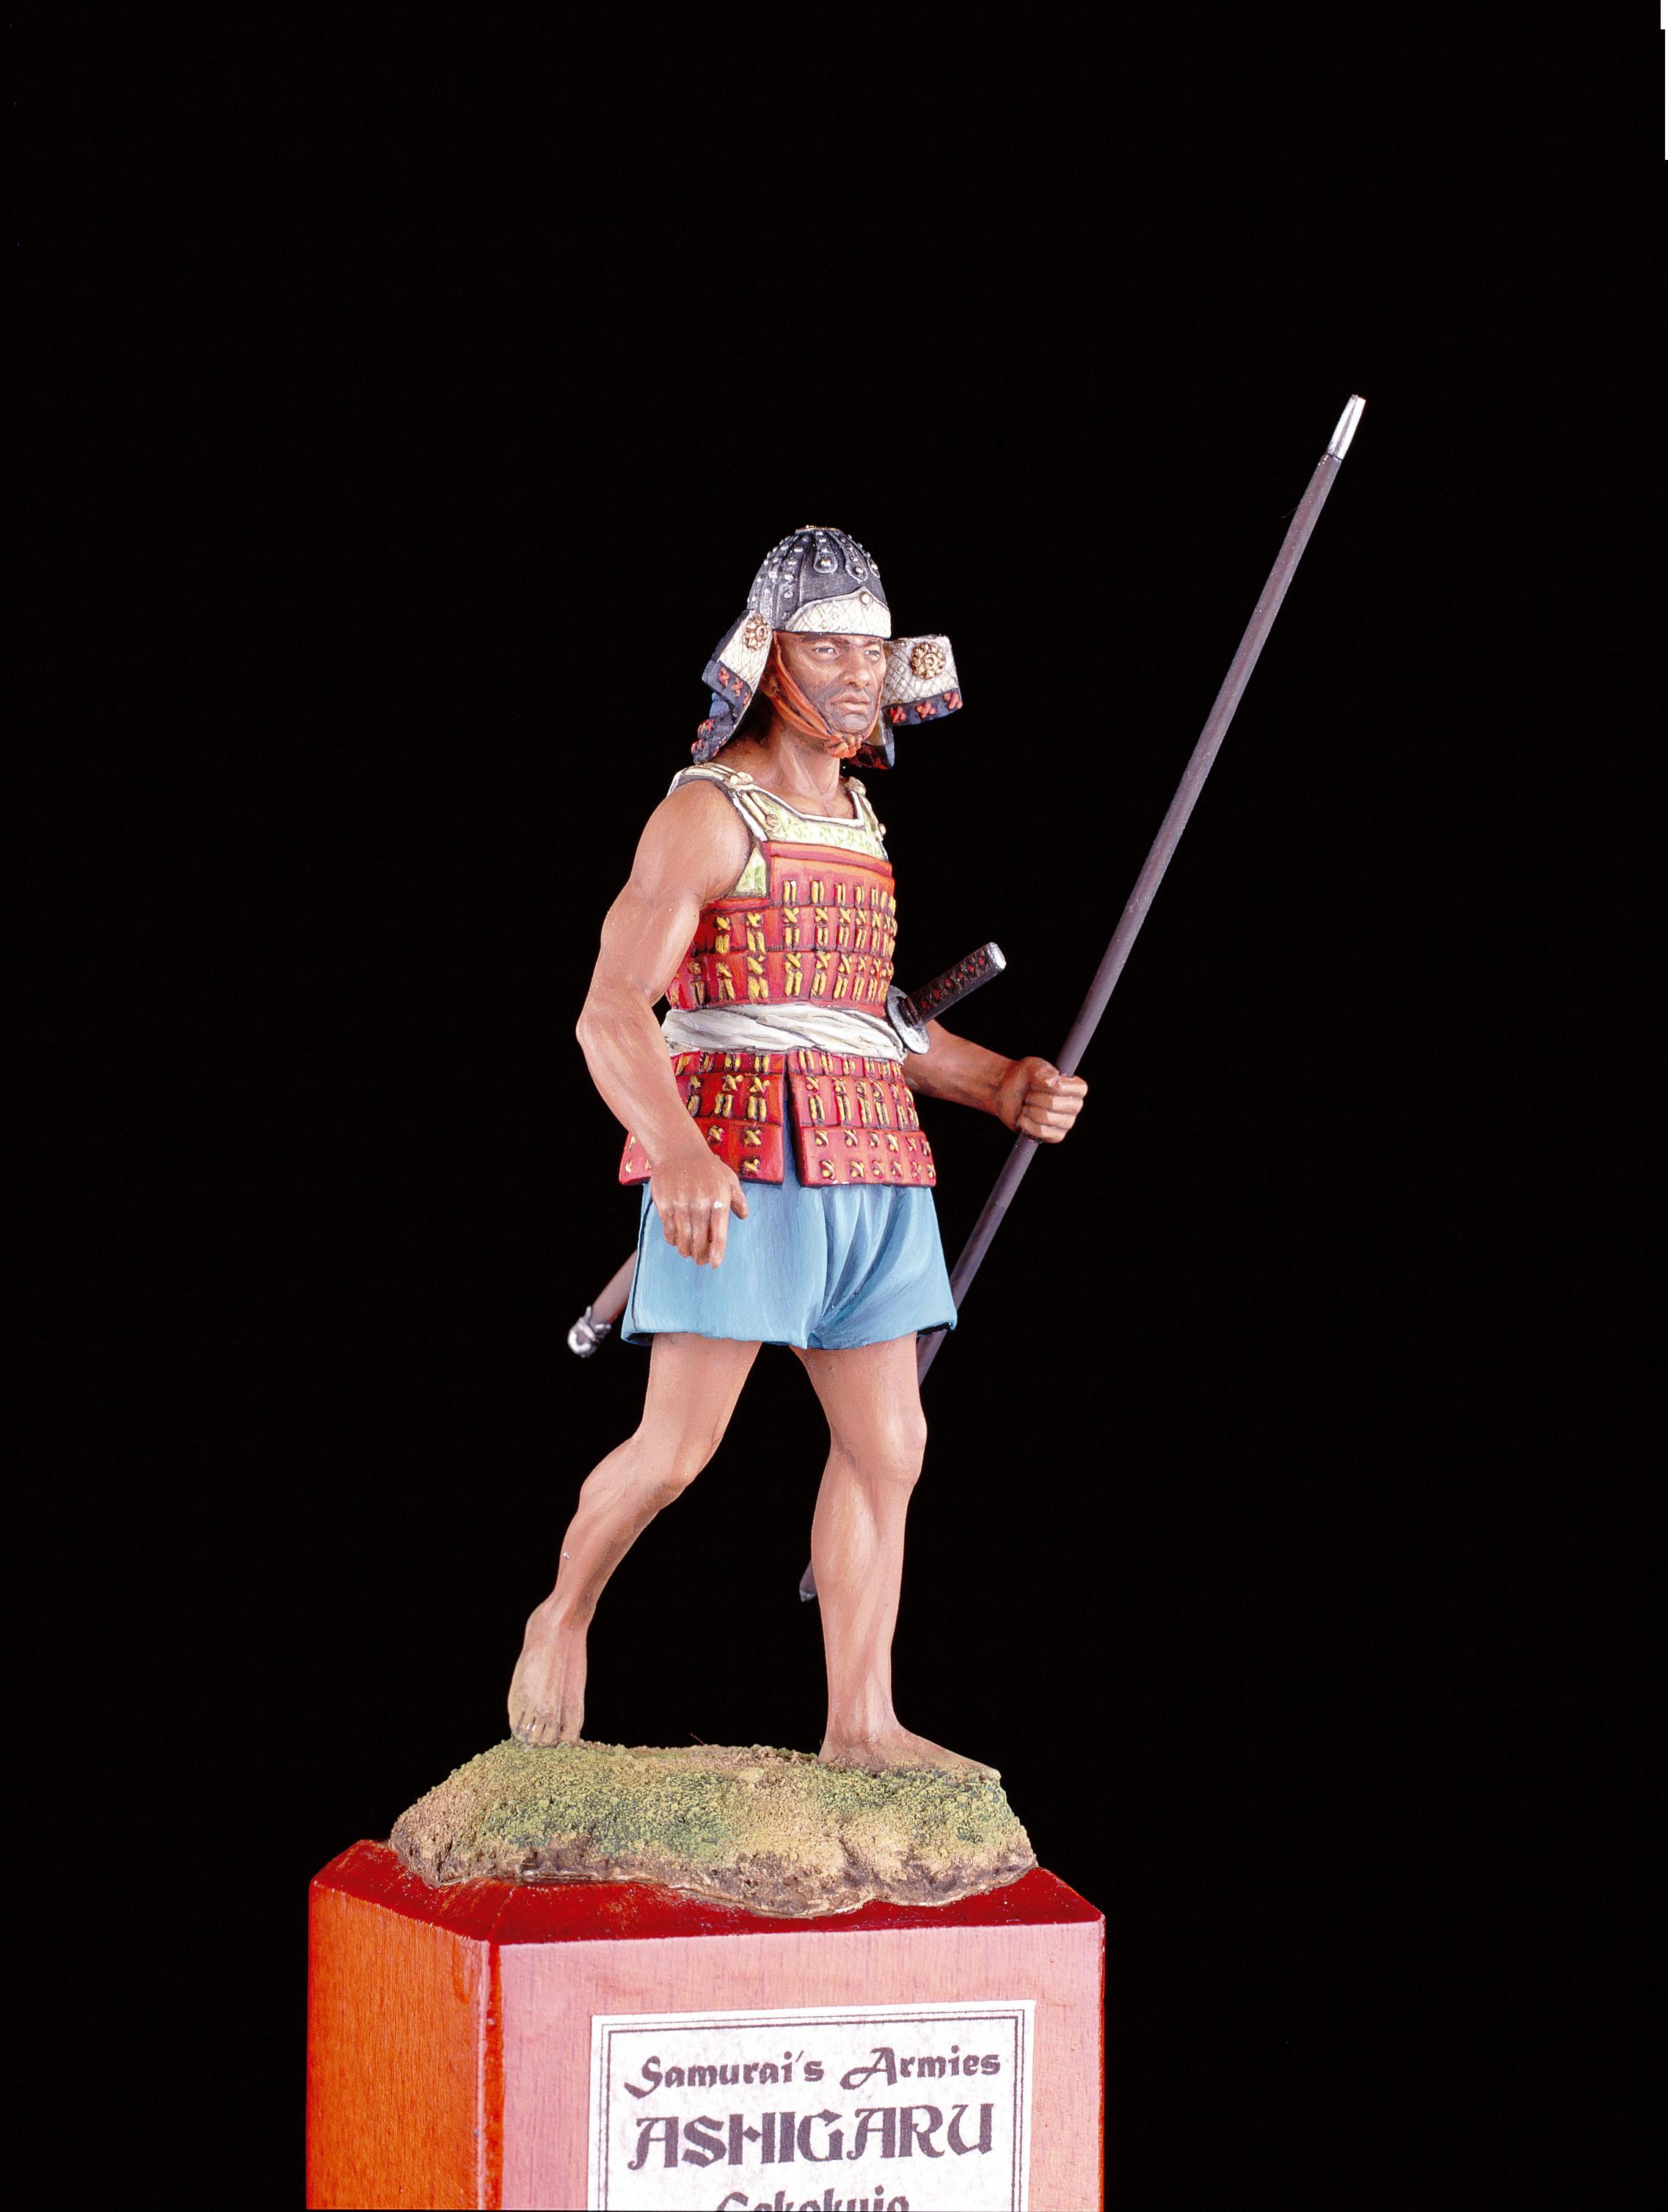 Samurai Army Figurine, 1553 (Amati)